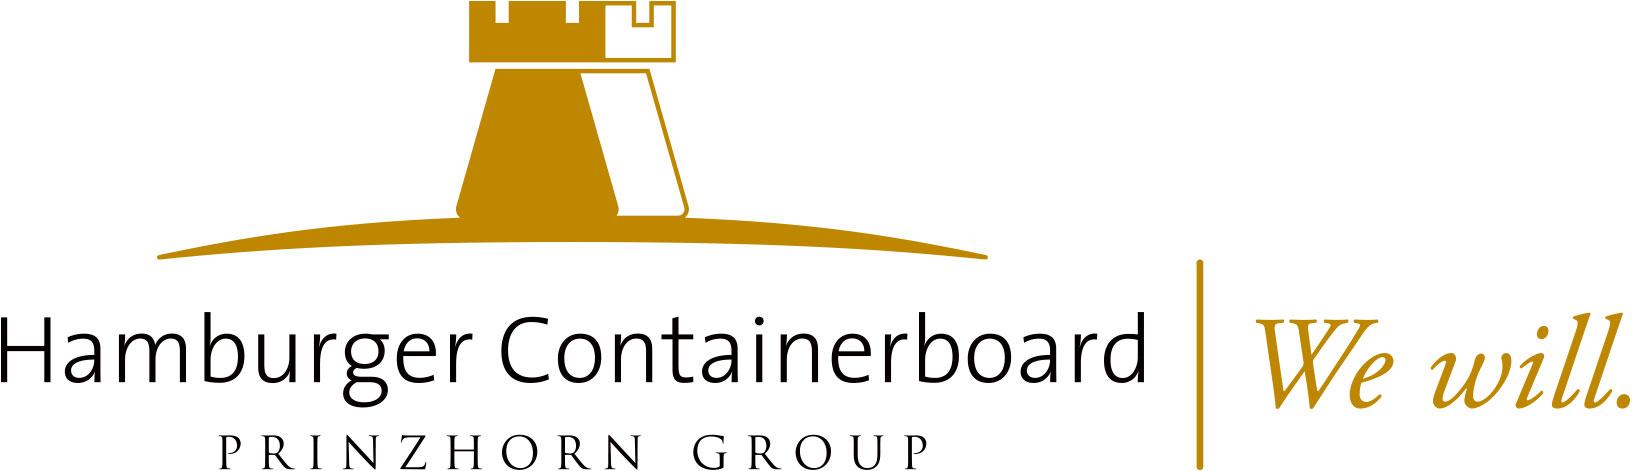 Hamburger Containerboard